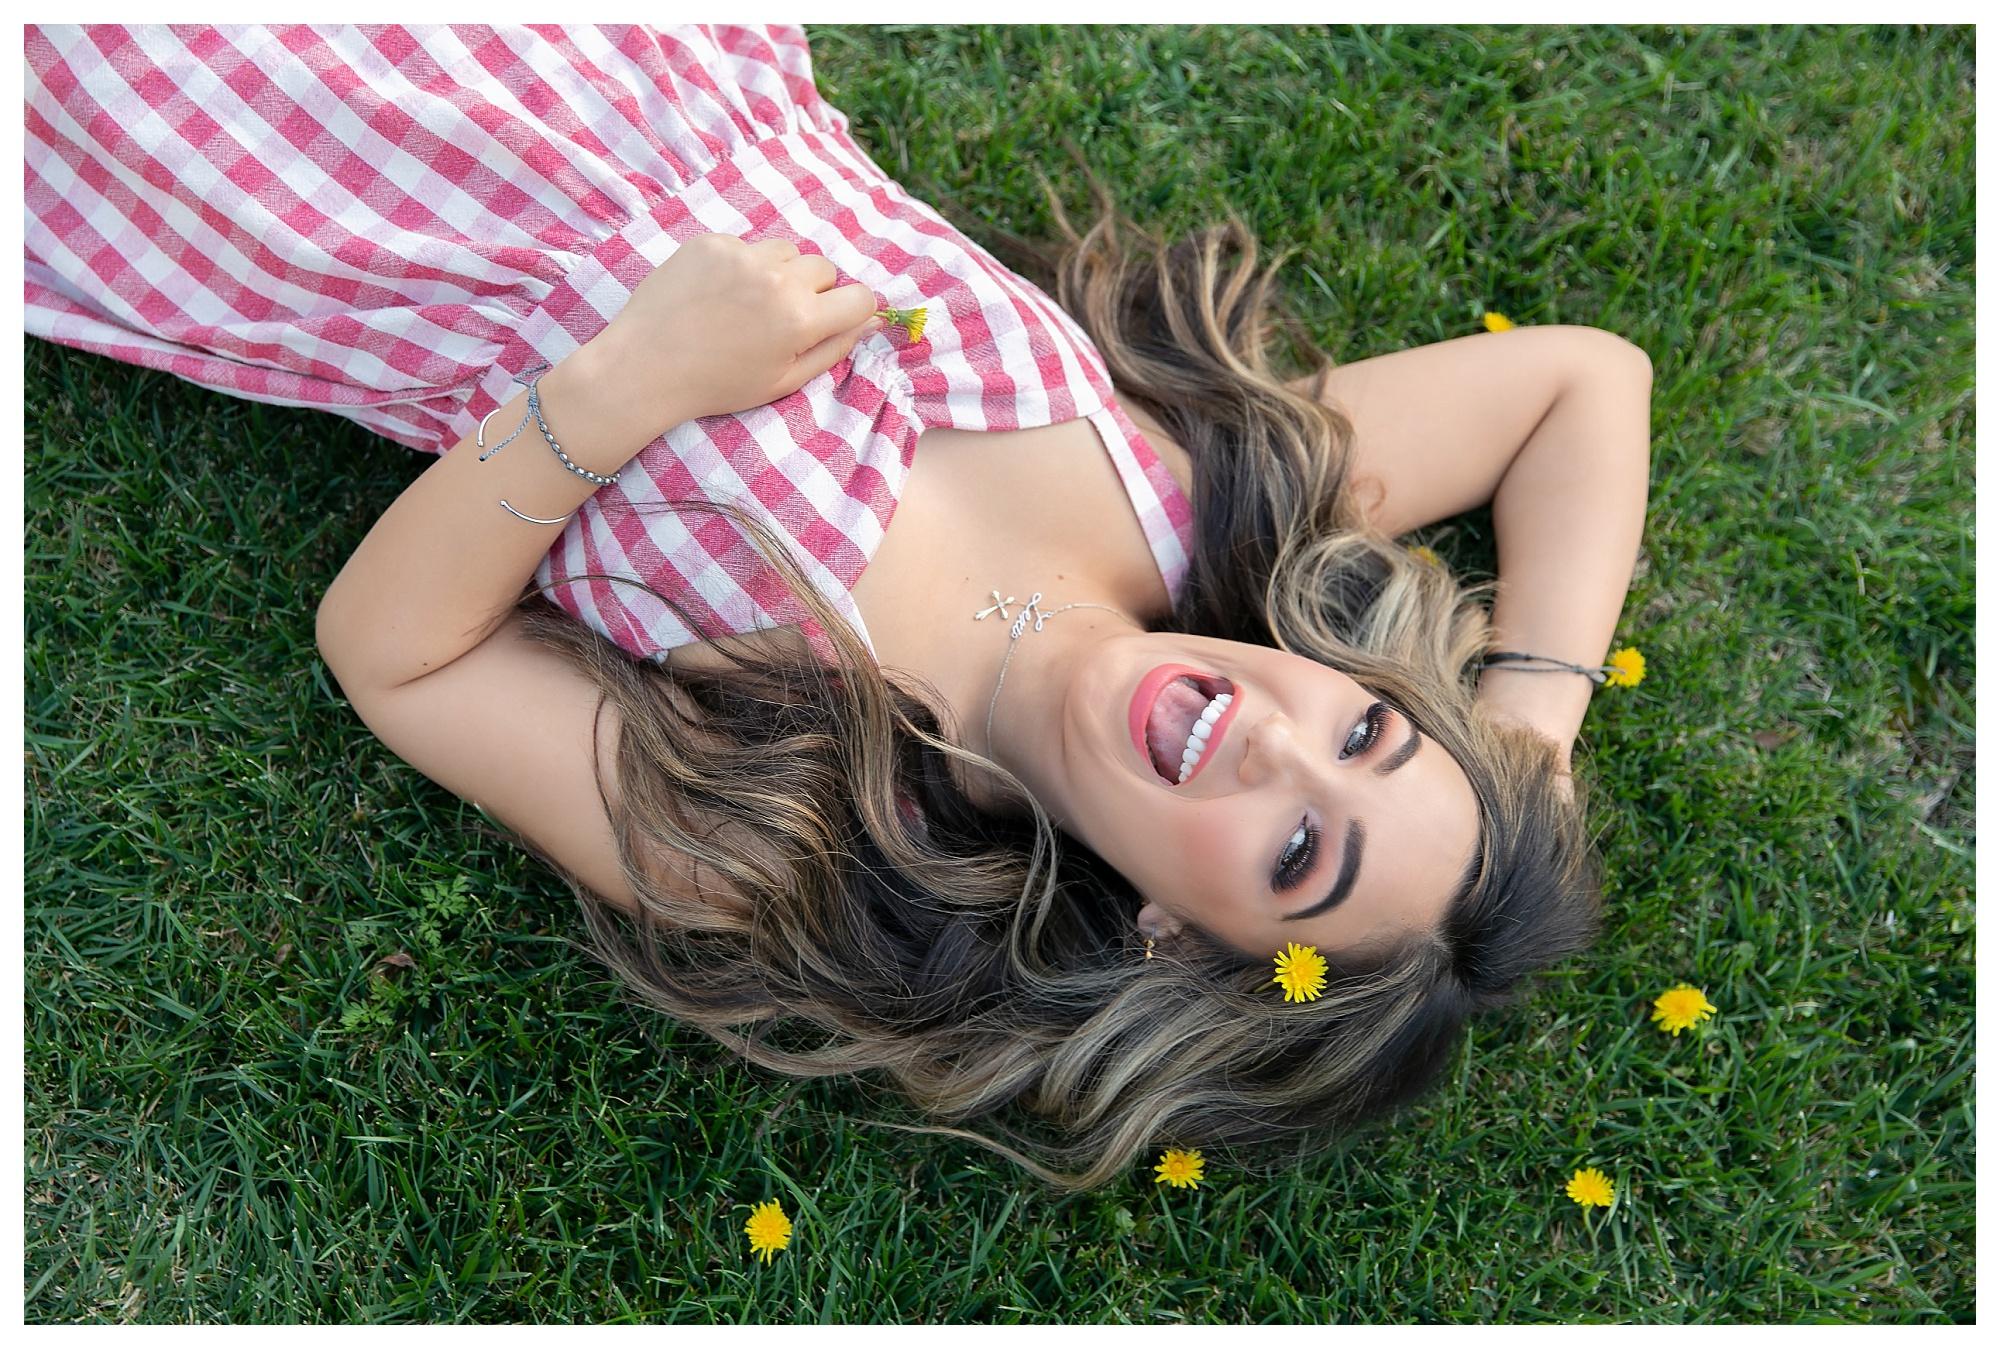 Teen girl in dandelion flowers